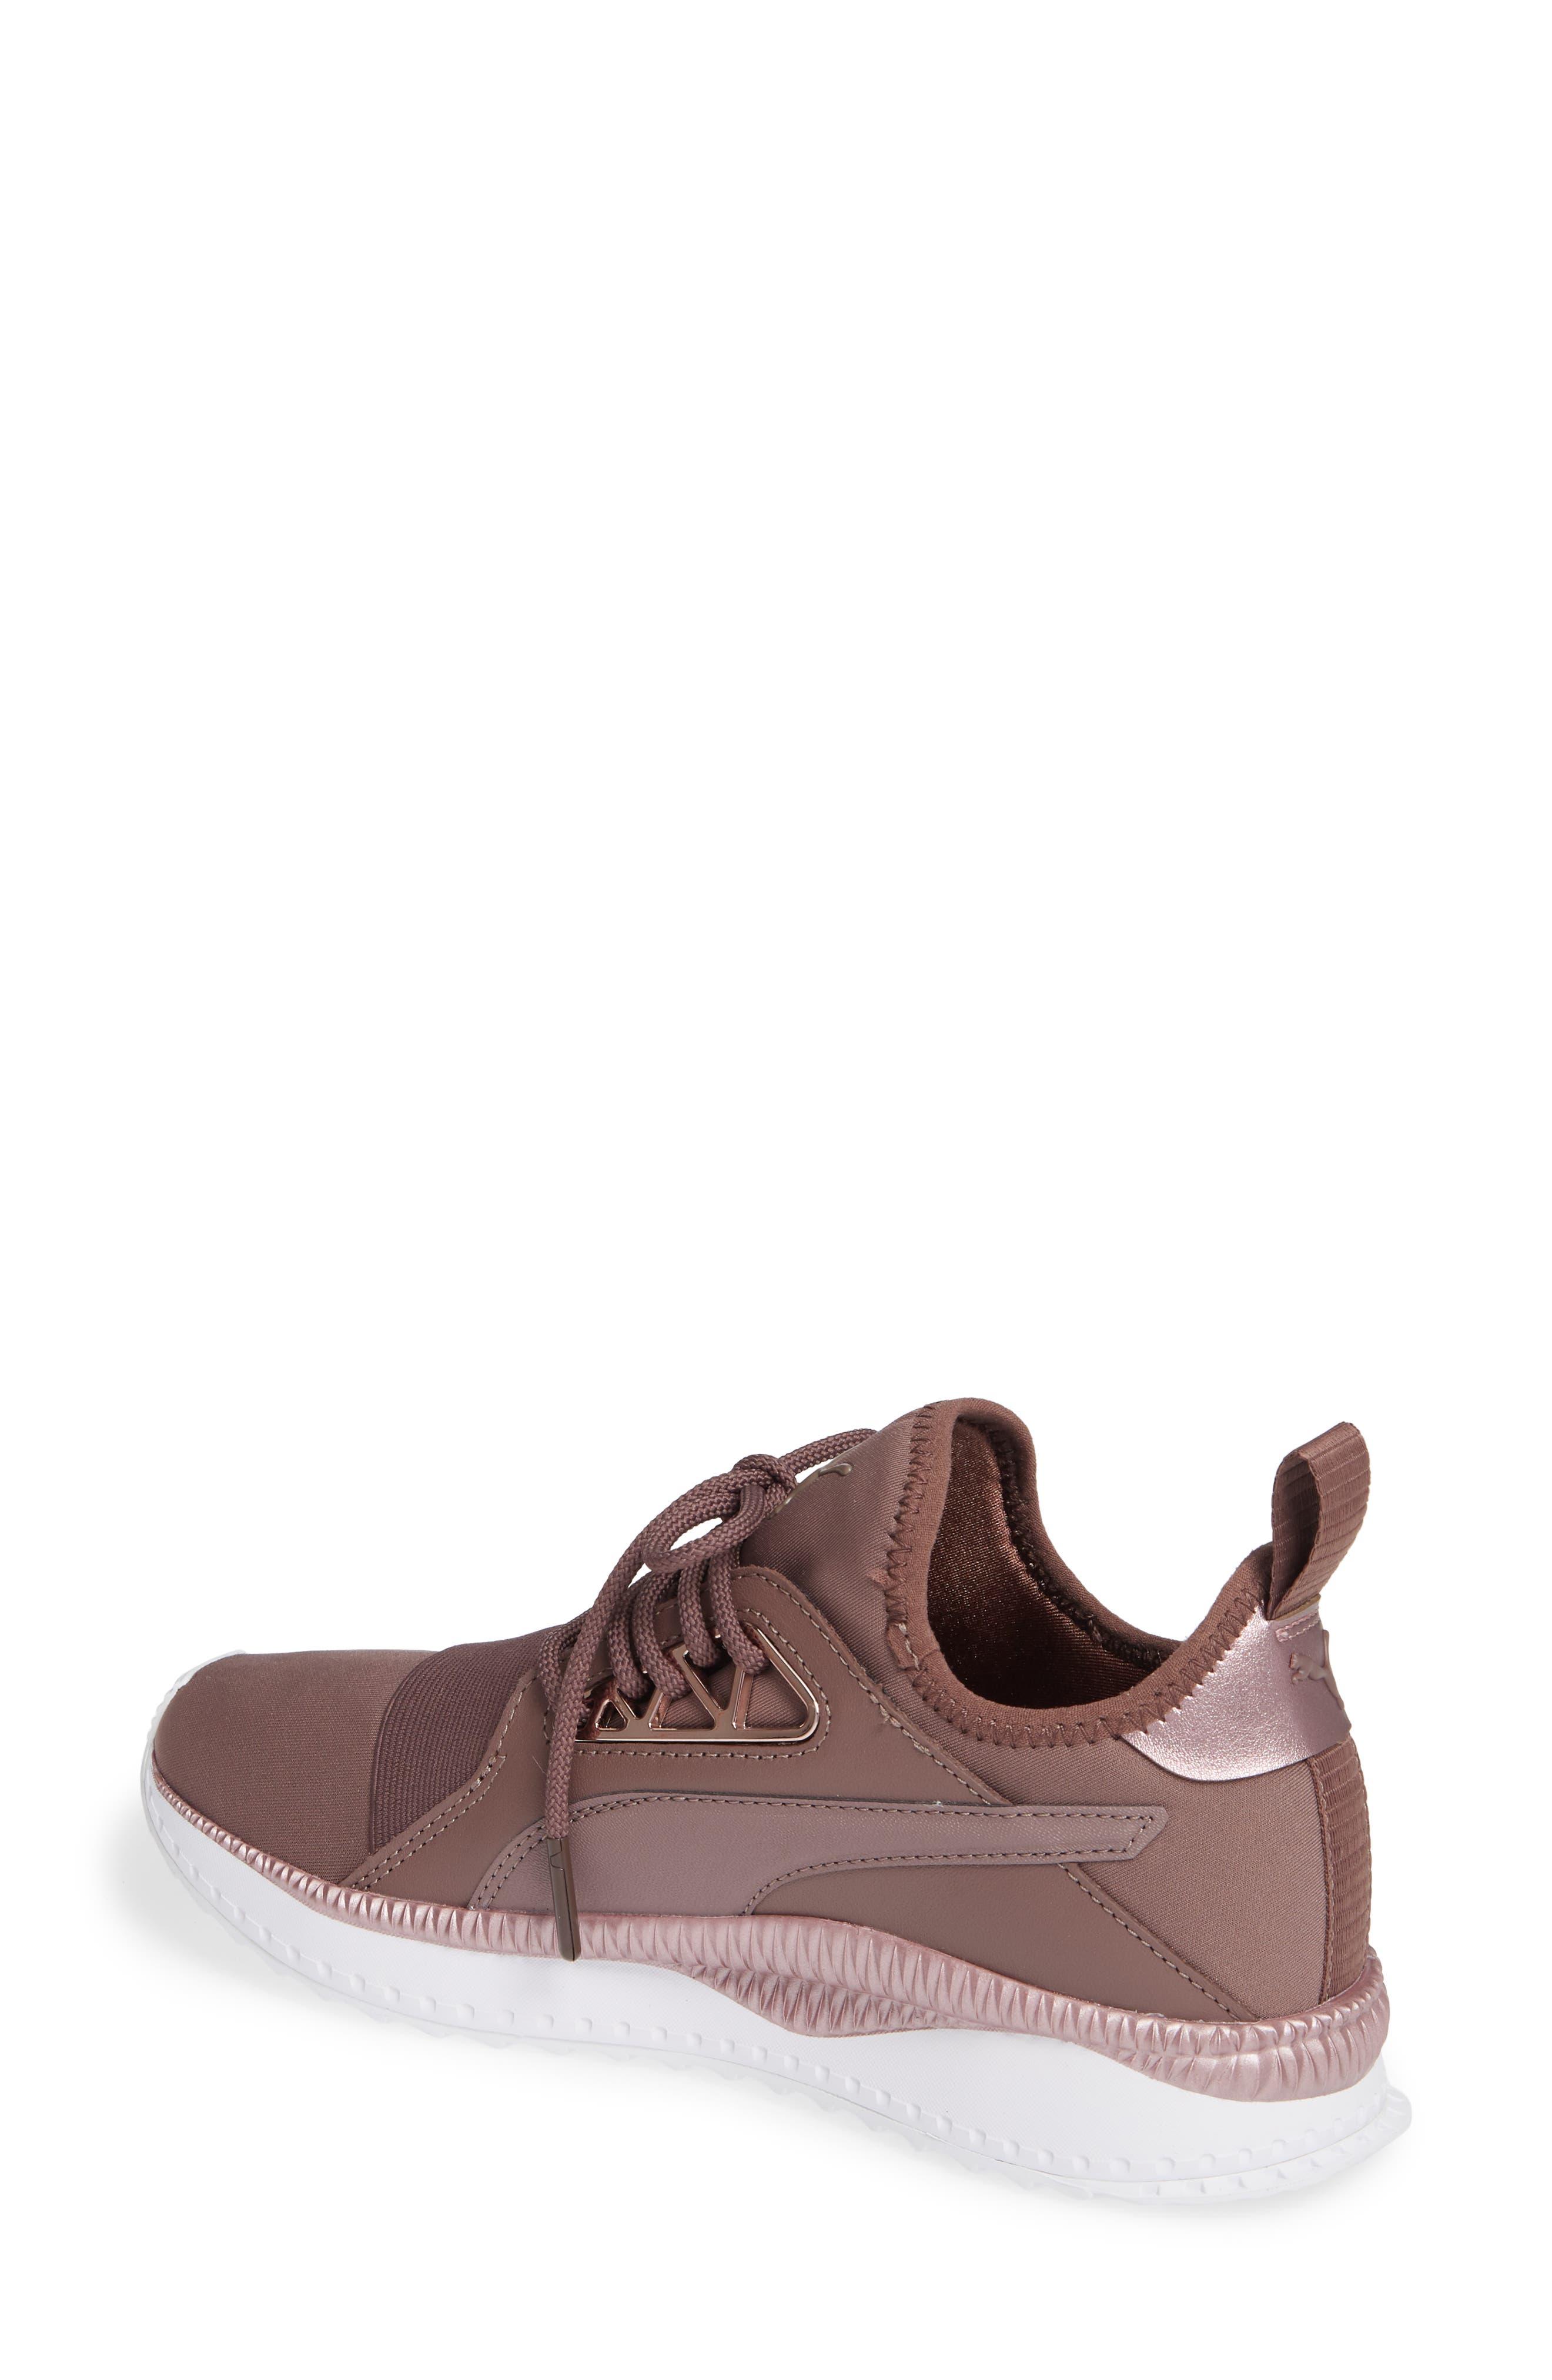 PUMA, TSUGI Apex Jewel Sneaker, Alternate thumbnail 2, color, PEPPERCORN/ PEPPERCORN